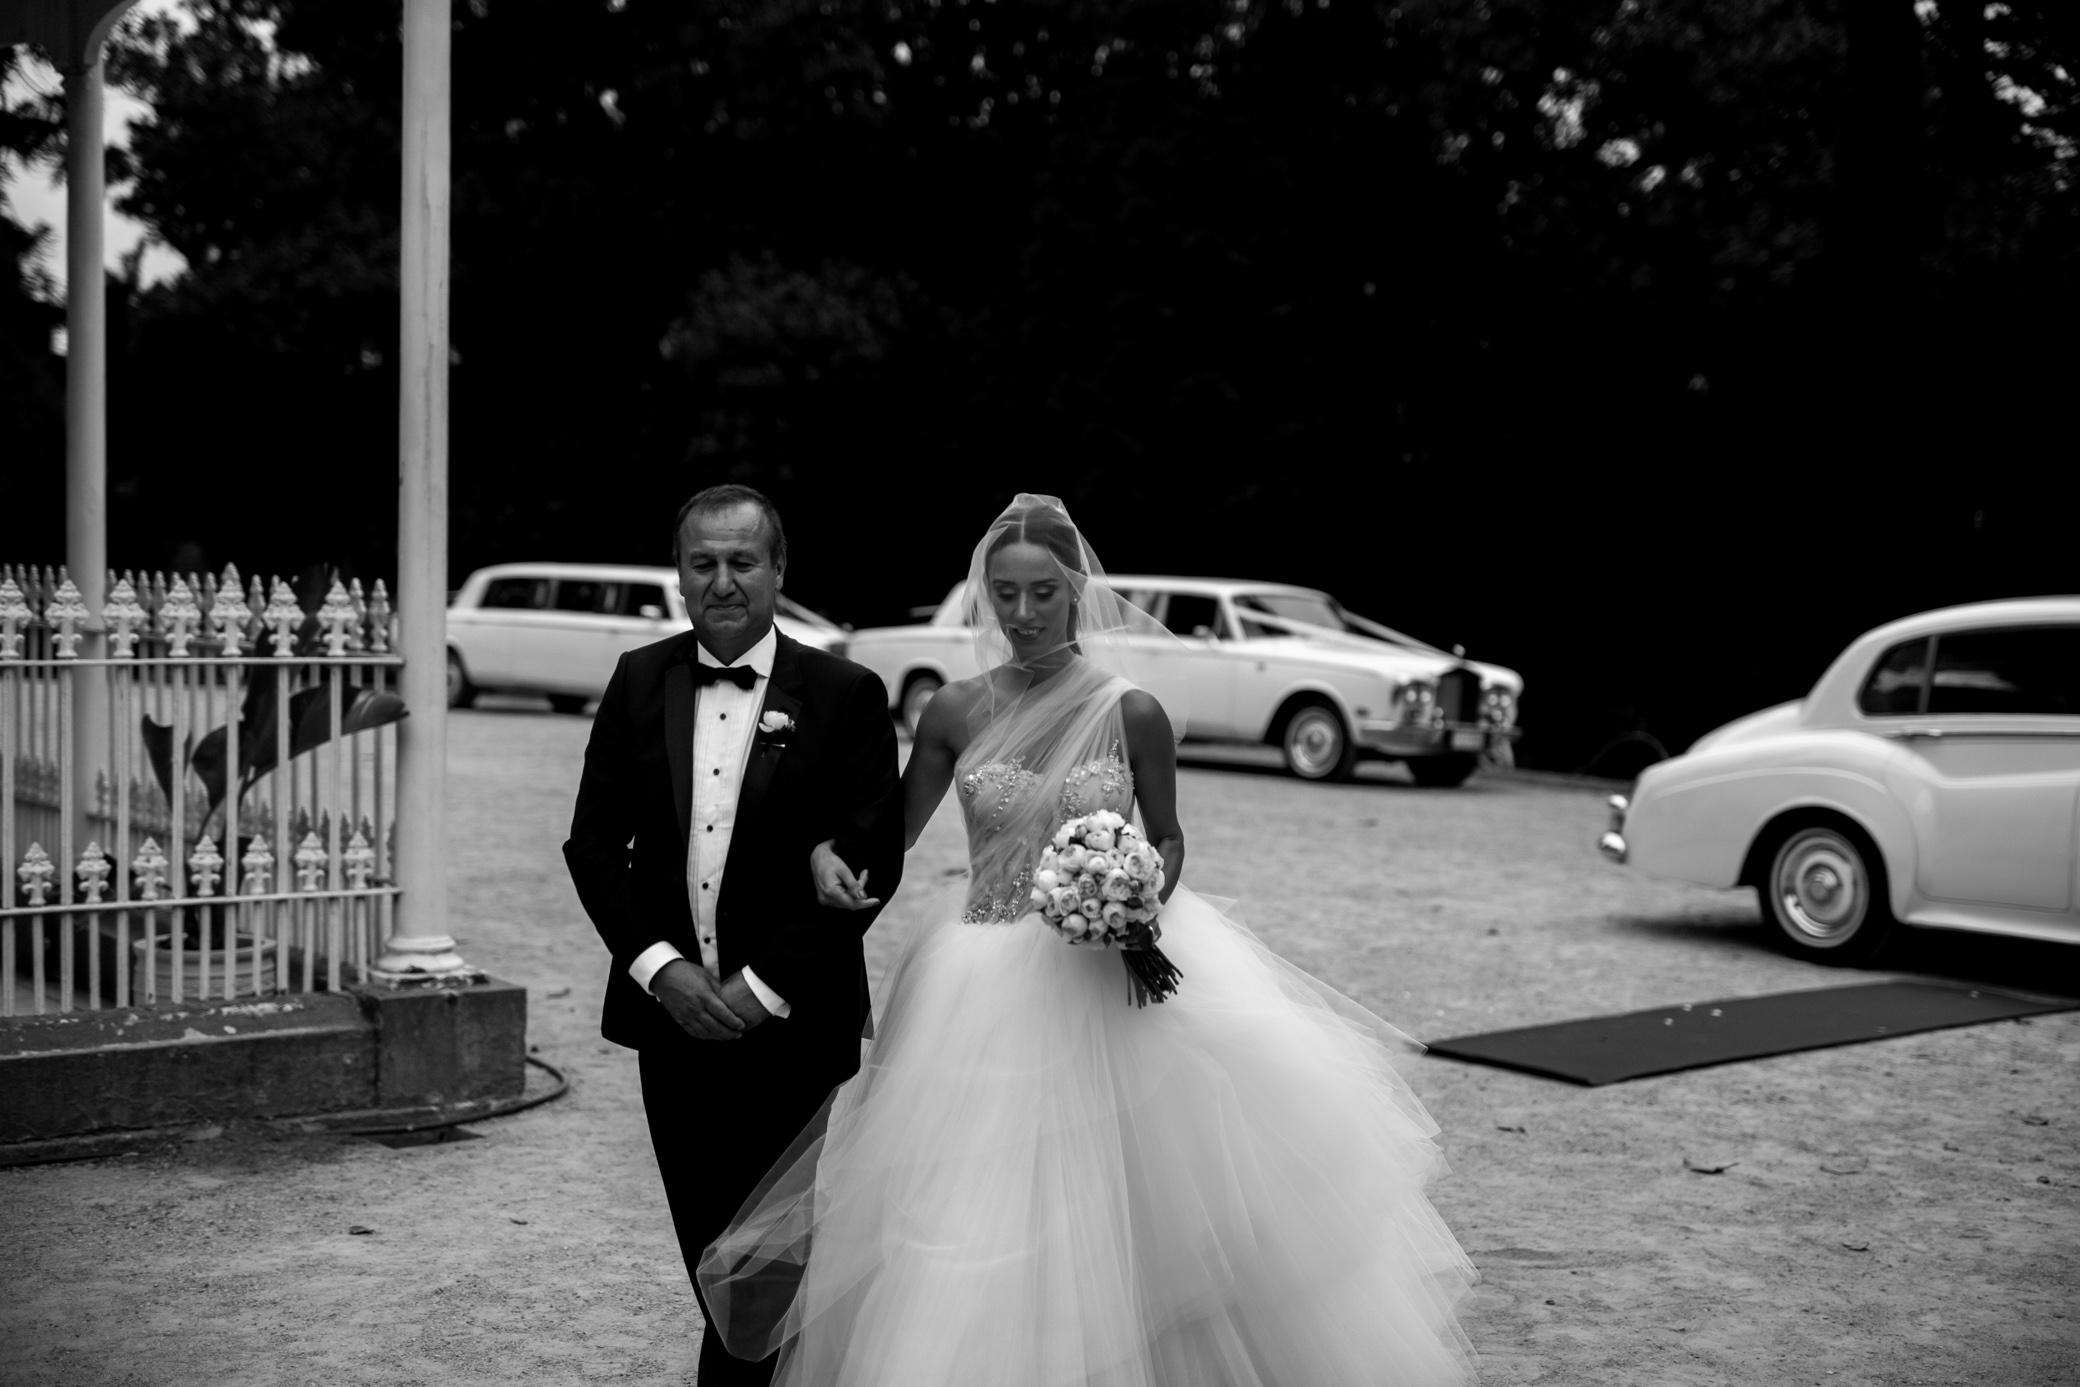 mr-theodore_white-vine-photography_same-sex-wedding-directory10.jpg